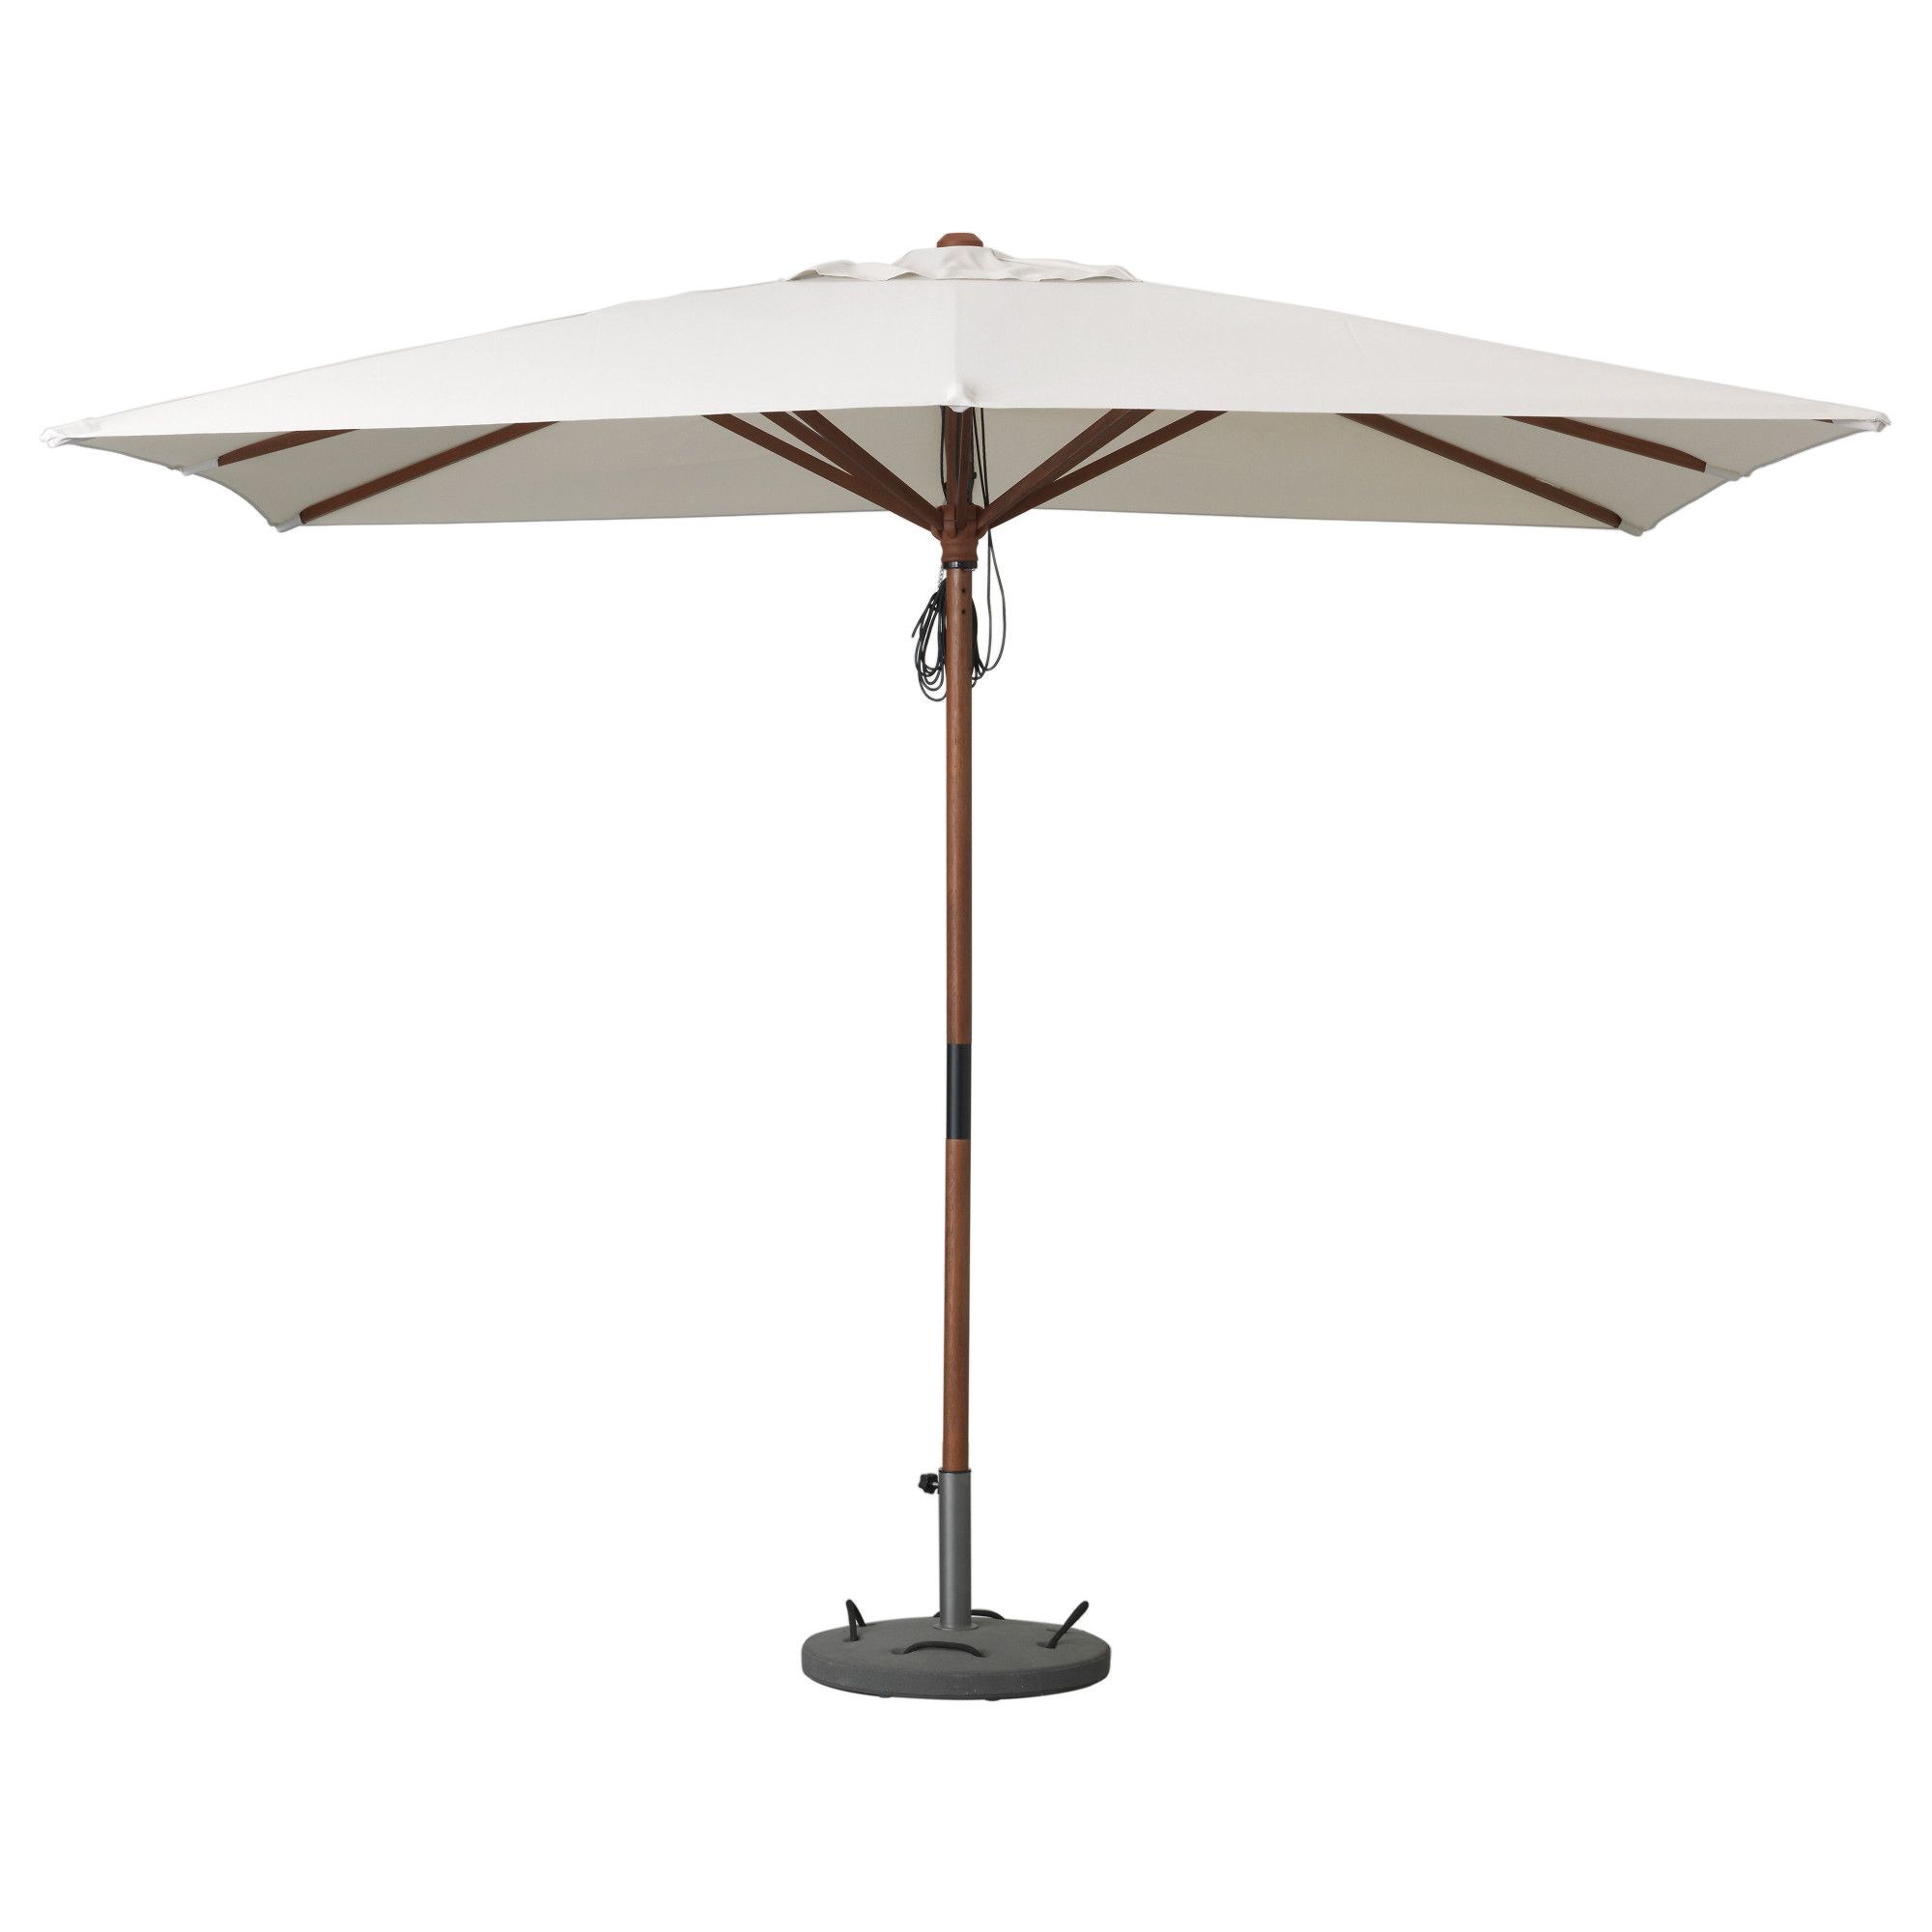 LÅNGHOLMEN / LÖKÖ Umbrella with base - IKEA | for the